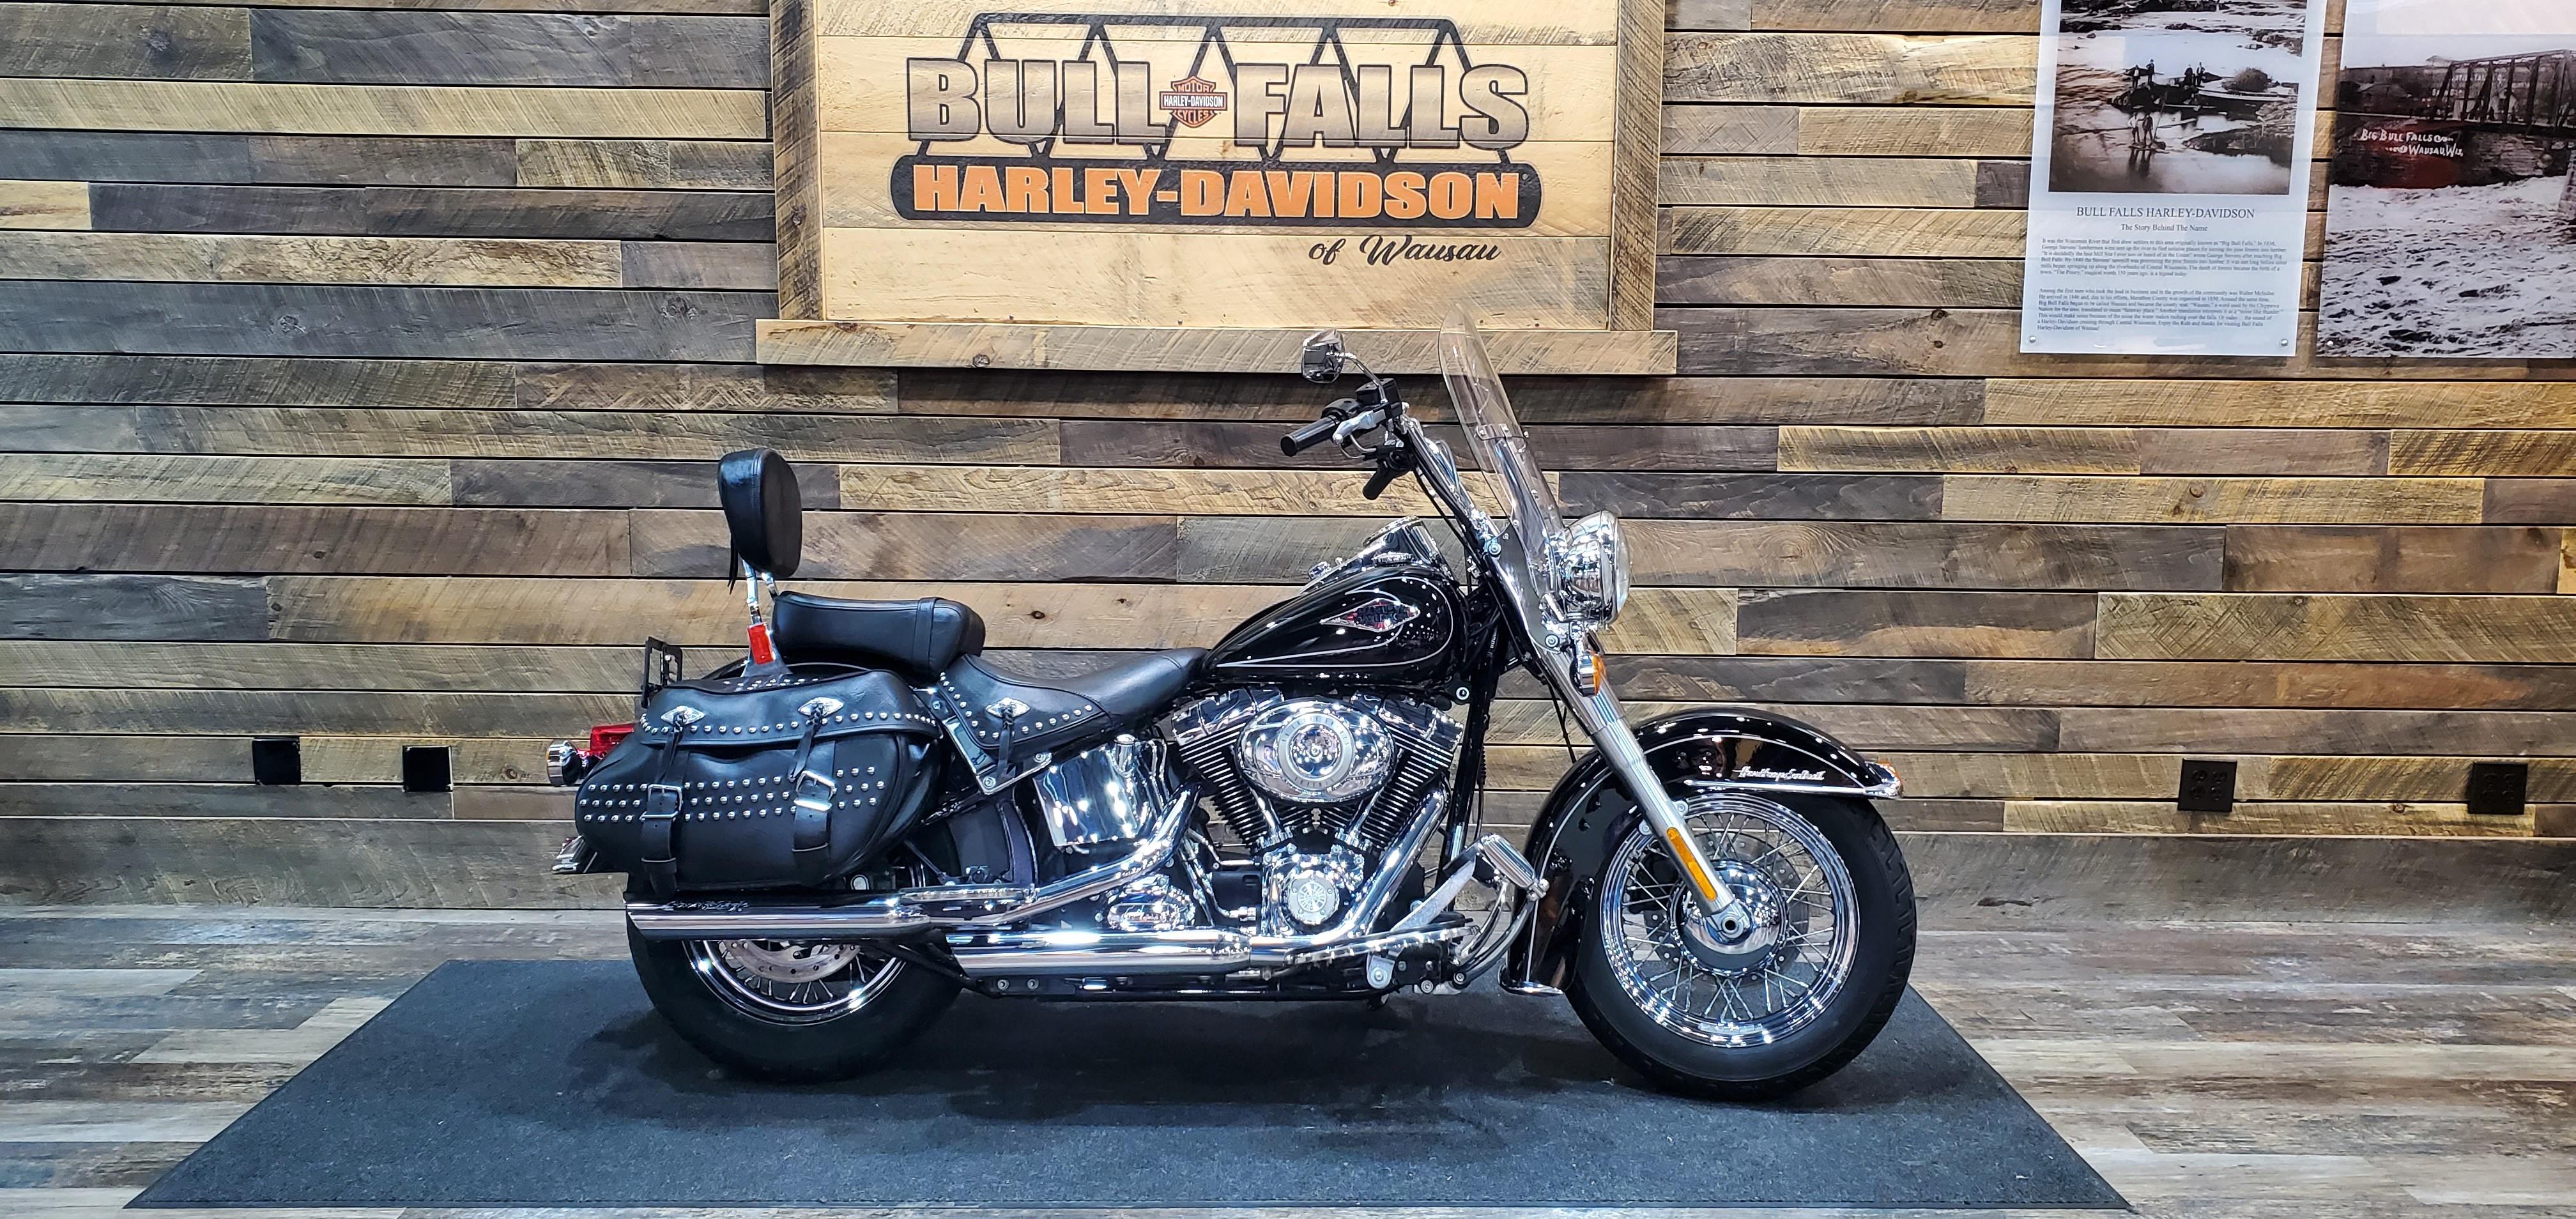 2009 Harley-Davidson Softail Heritage Softail Classic at Bull Falls Harley-Davidson